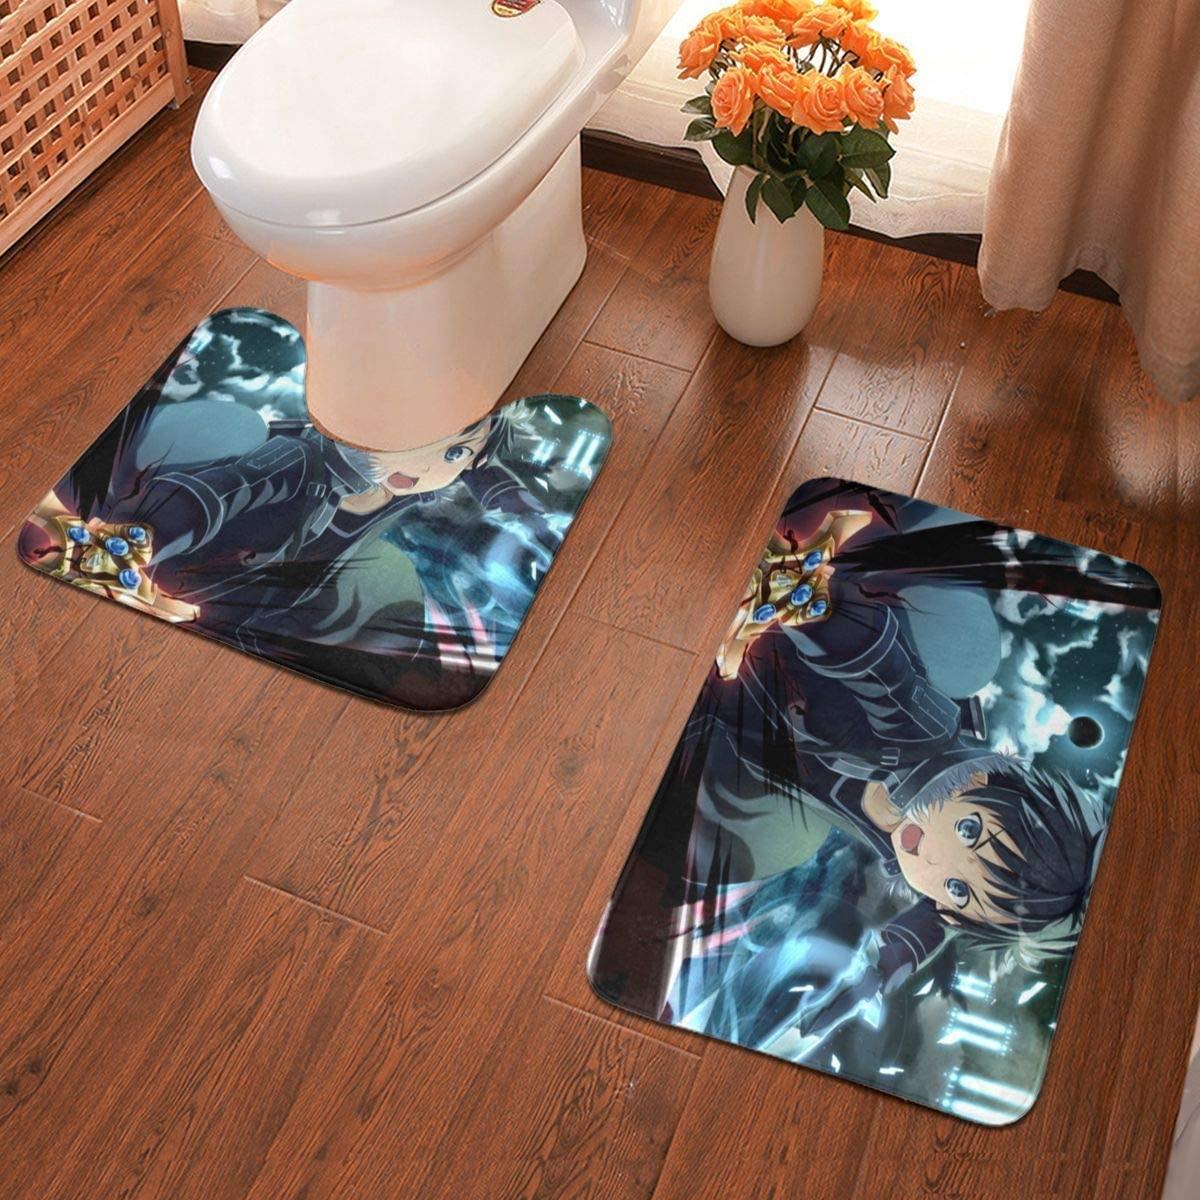 Anime Sword Art Online Bathroom Antiskid Pad Non-Slip Bath Carpet Floor Mat Rug 2 Sets -Floor Mat+U-Shaped Pad, Toilet Washable Blanket Mats for Bathroom Home Shower